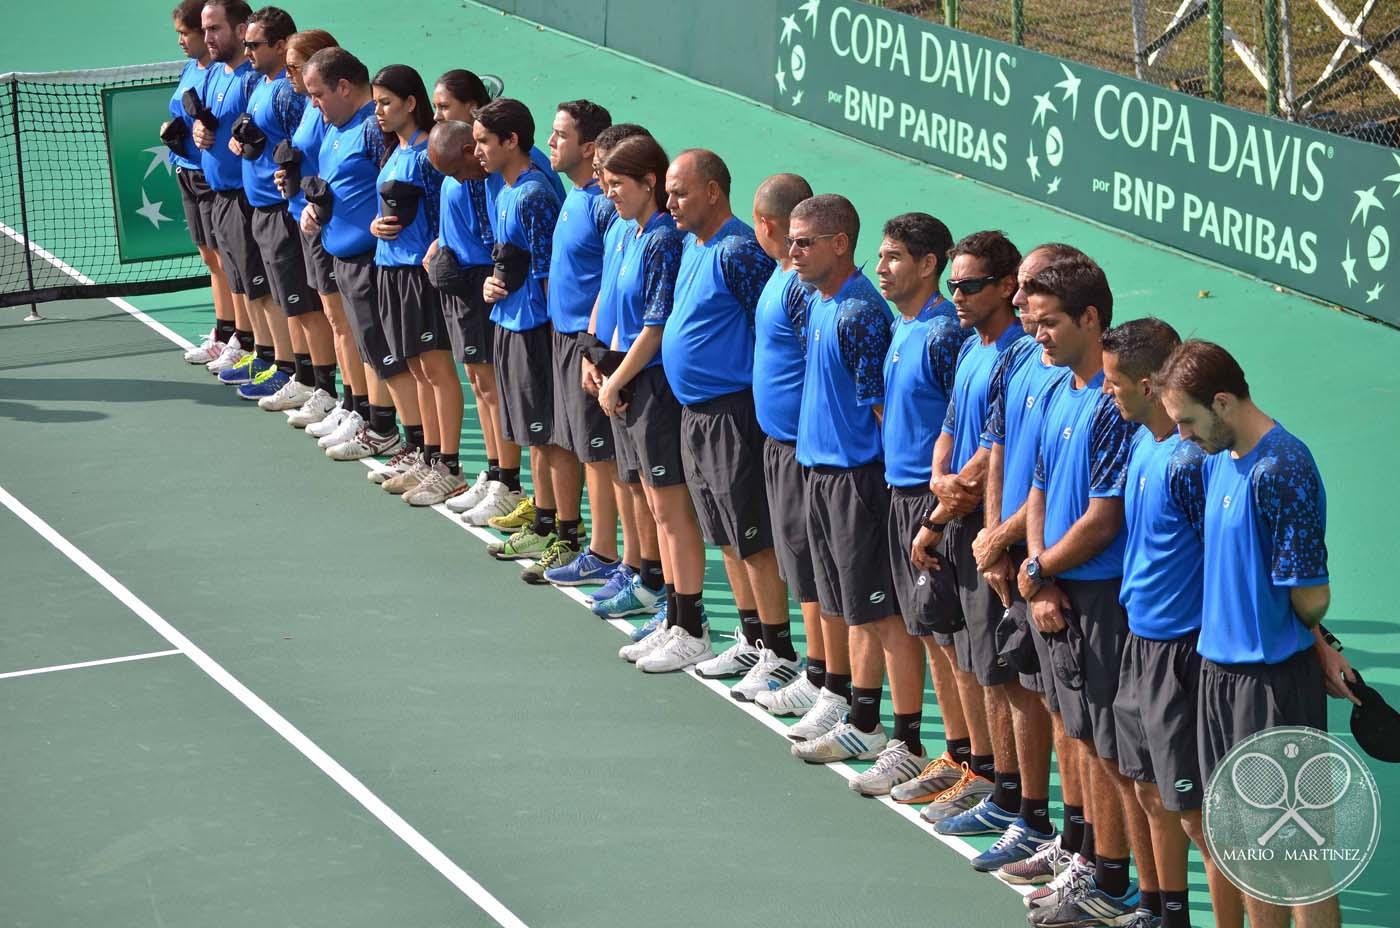 Jueces de linea Copa Davis